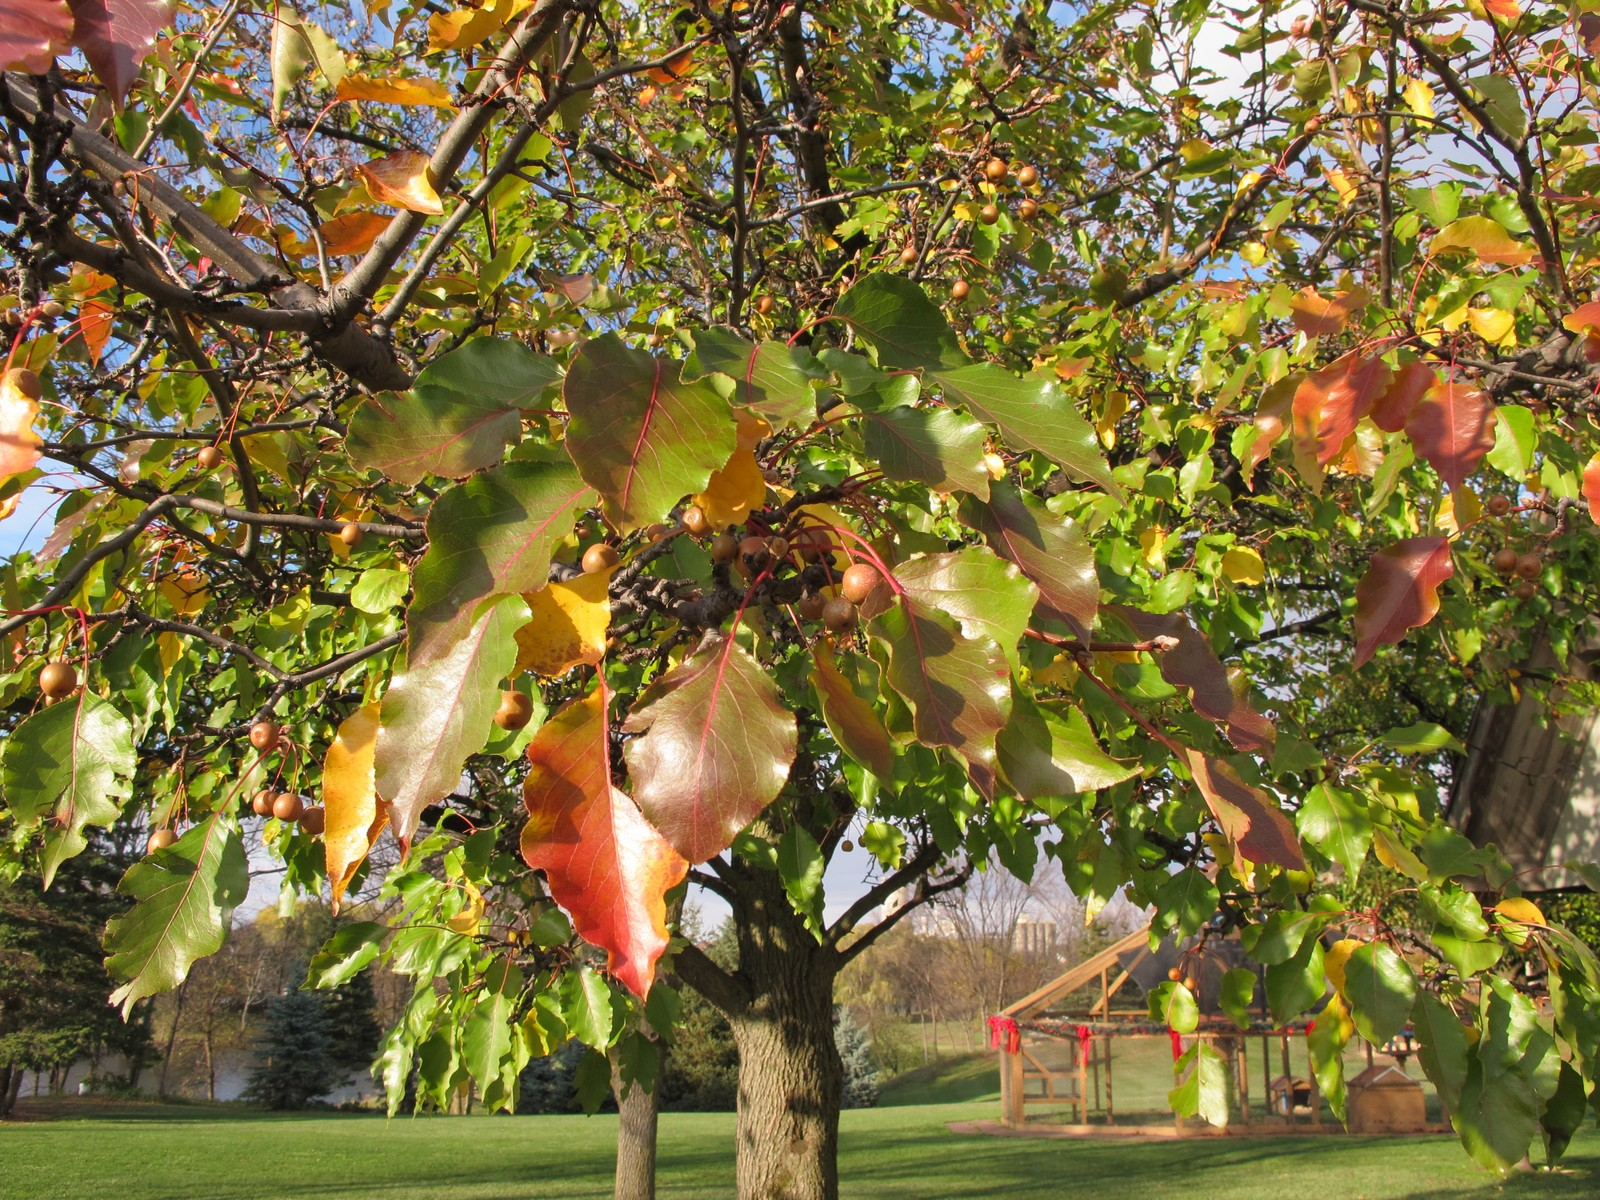 Perverdonk Wild Flowerstreesandshrubsapplecrabapple